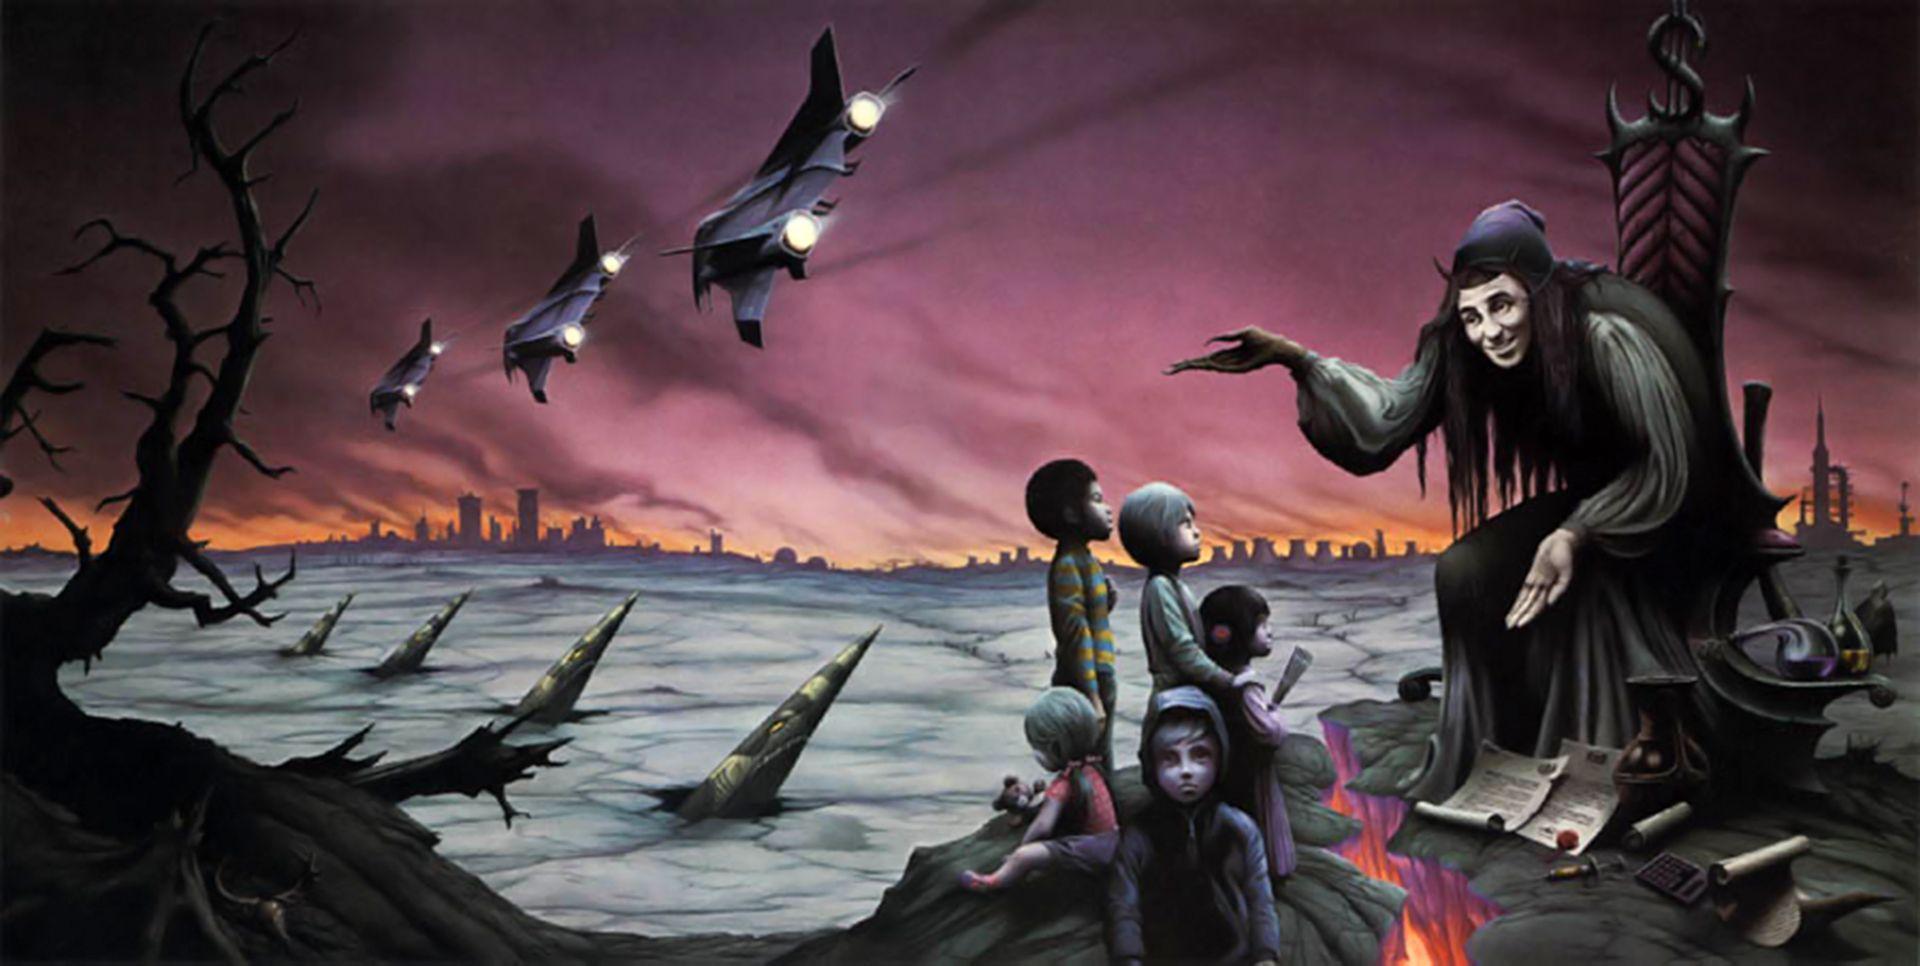 Rodney Matthews The Eleventh Hour Magnum album cover art 1983 | 70s sci fi  art, Art, Fantasy illustration